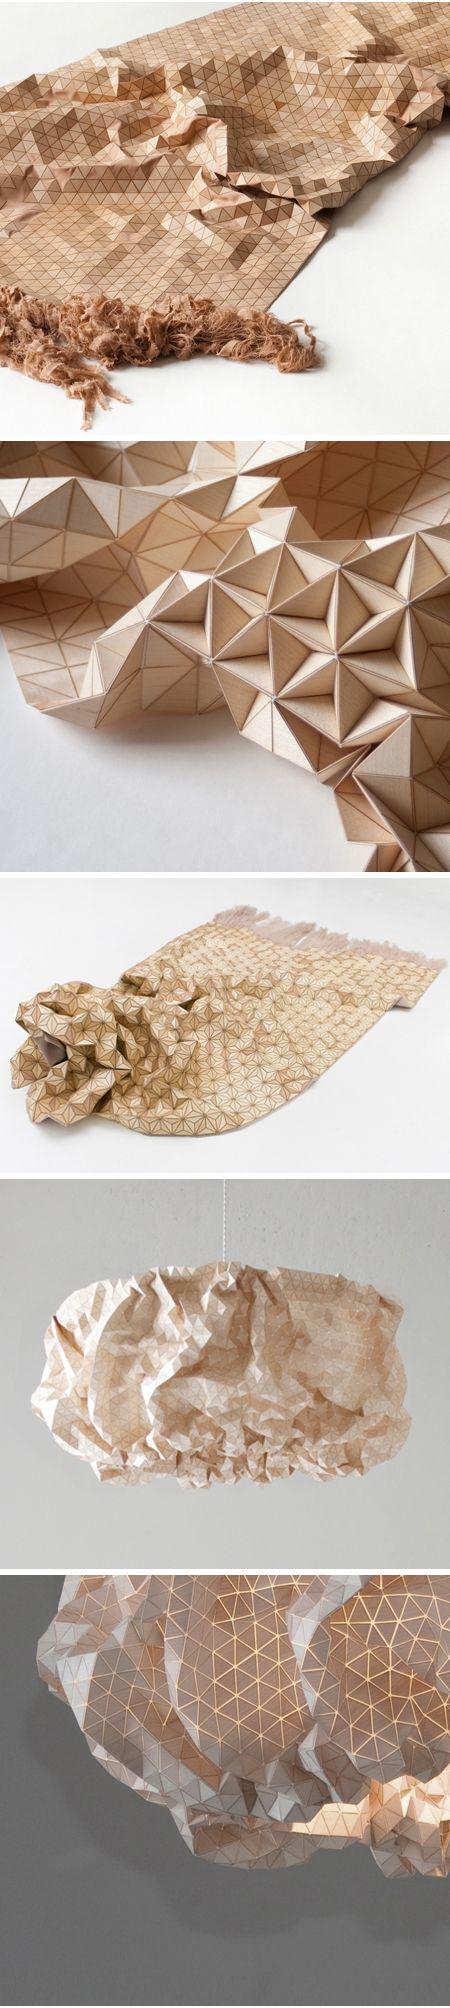 Wooden Fabric /  Eli